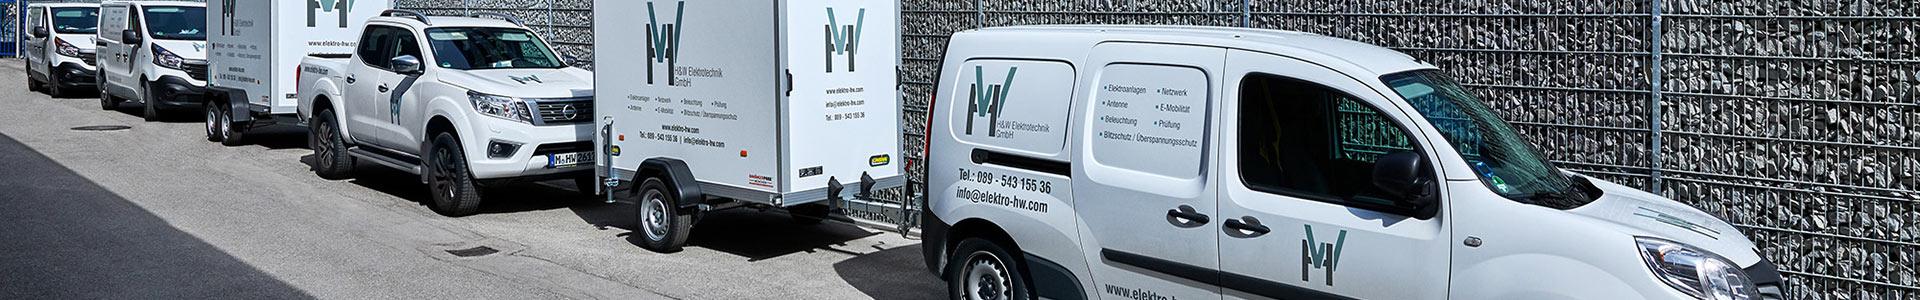 elektro_hw_Unternehmen